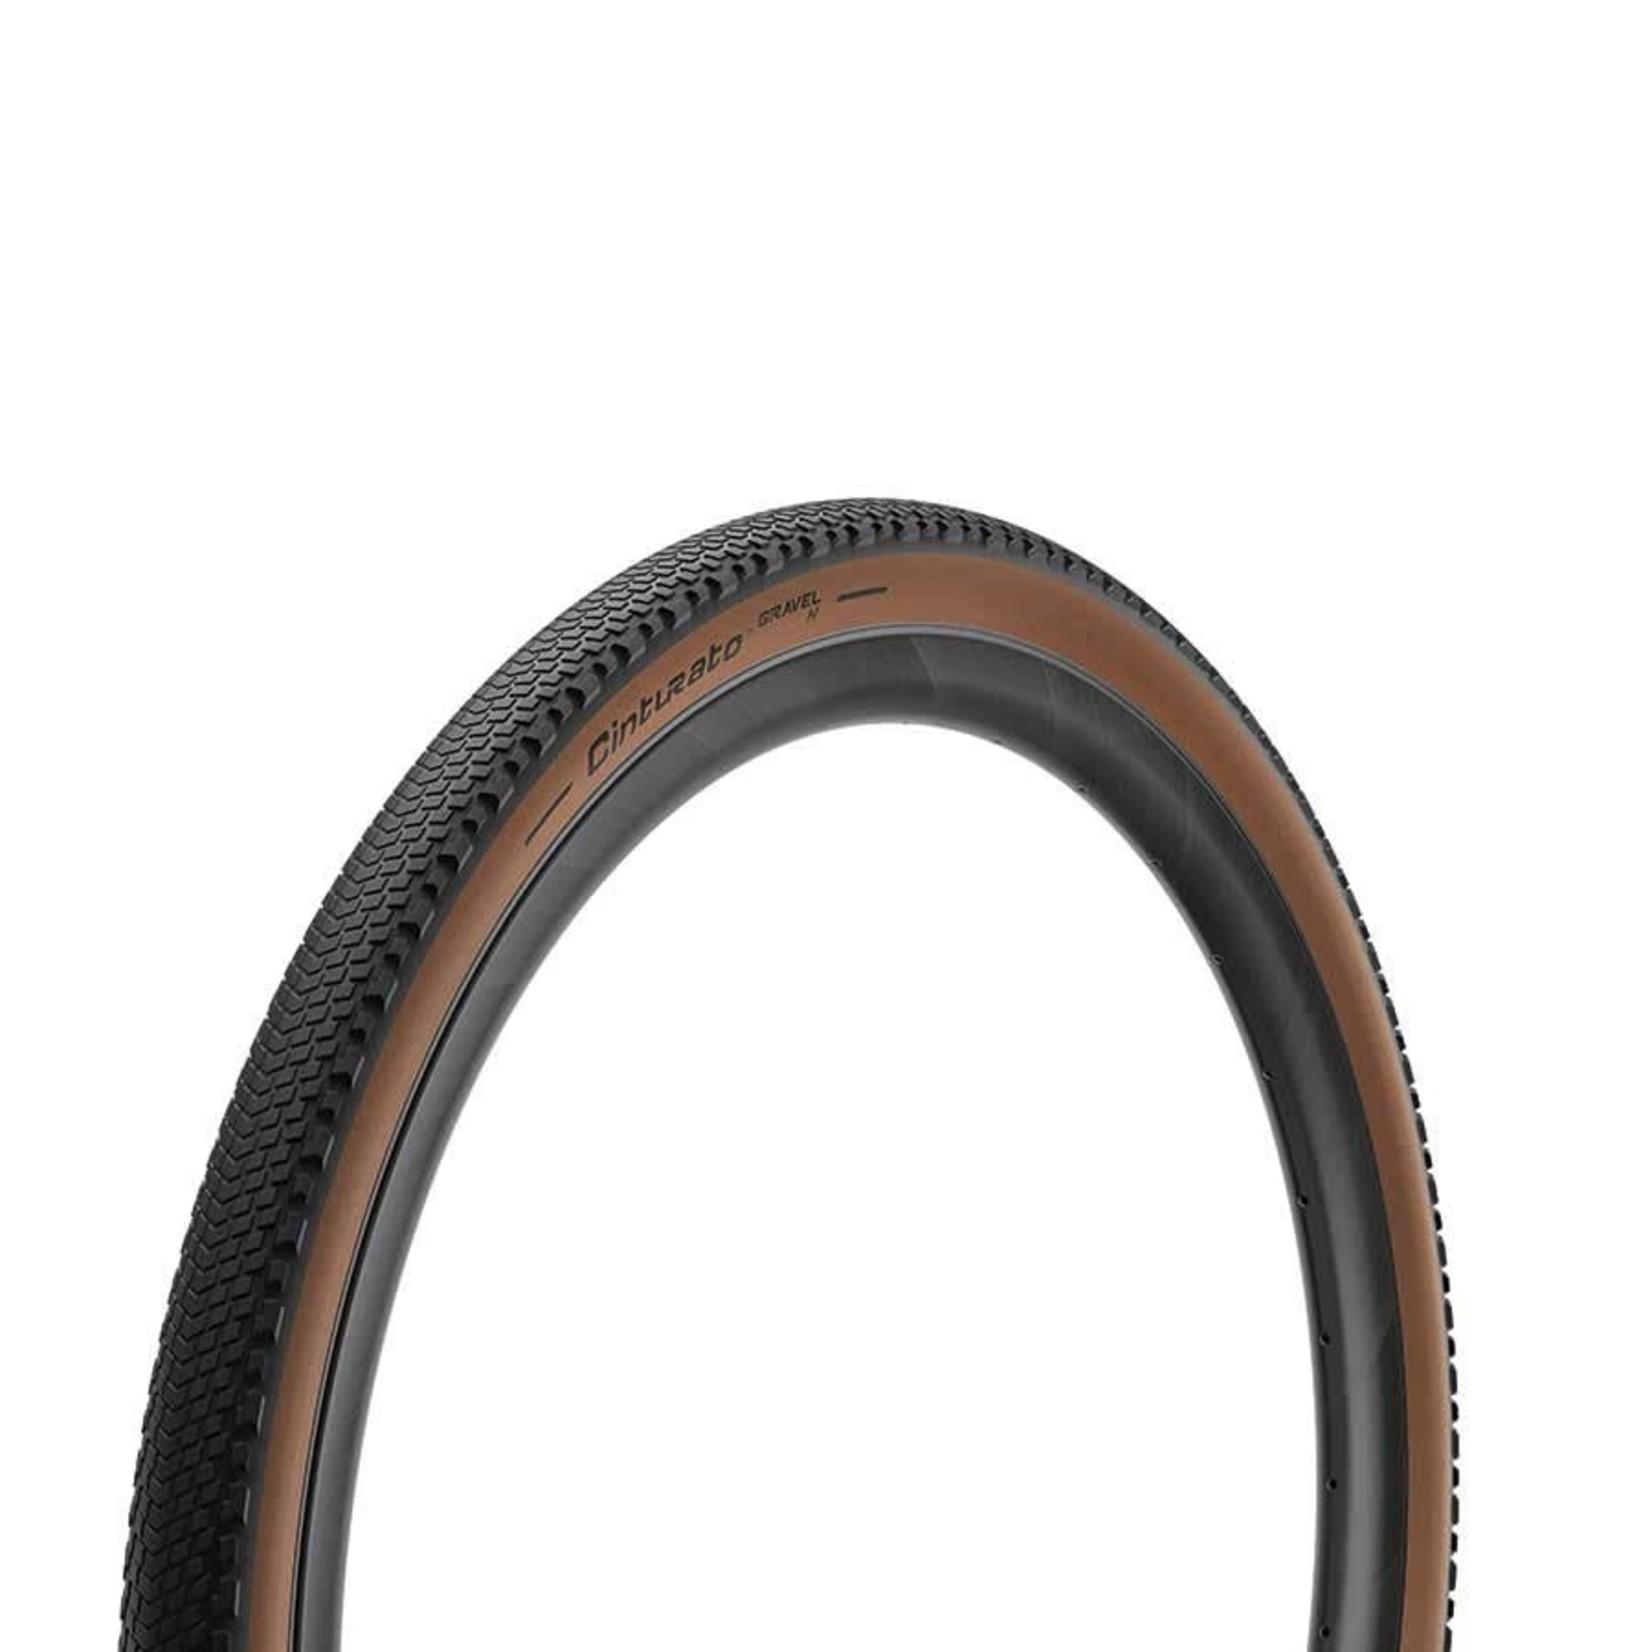 Pirelli Pirelli Cinturato Gravel H Folding Bead Tire, 700x35c Tanwall